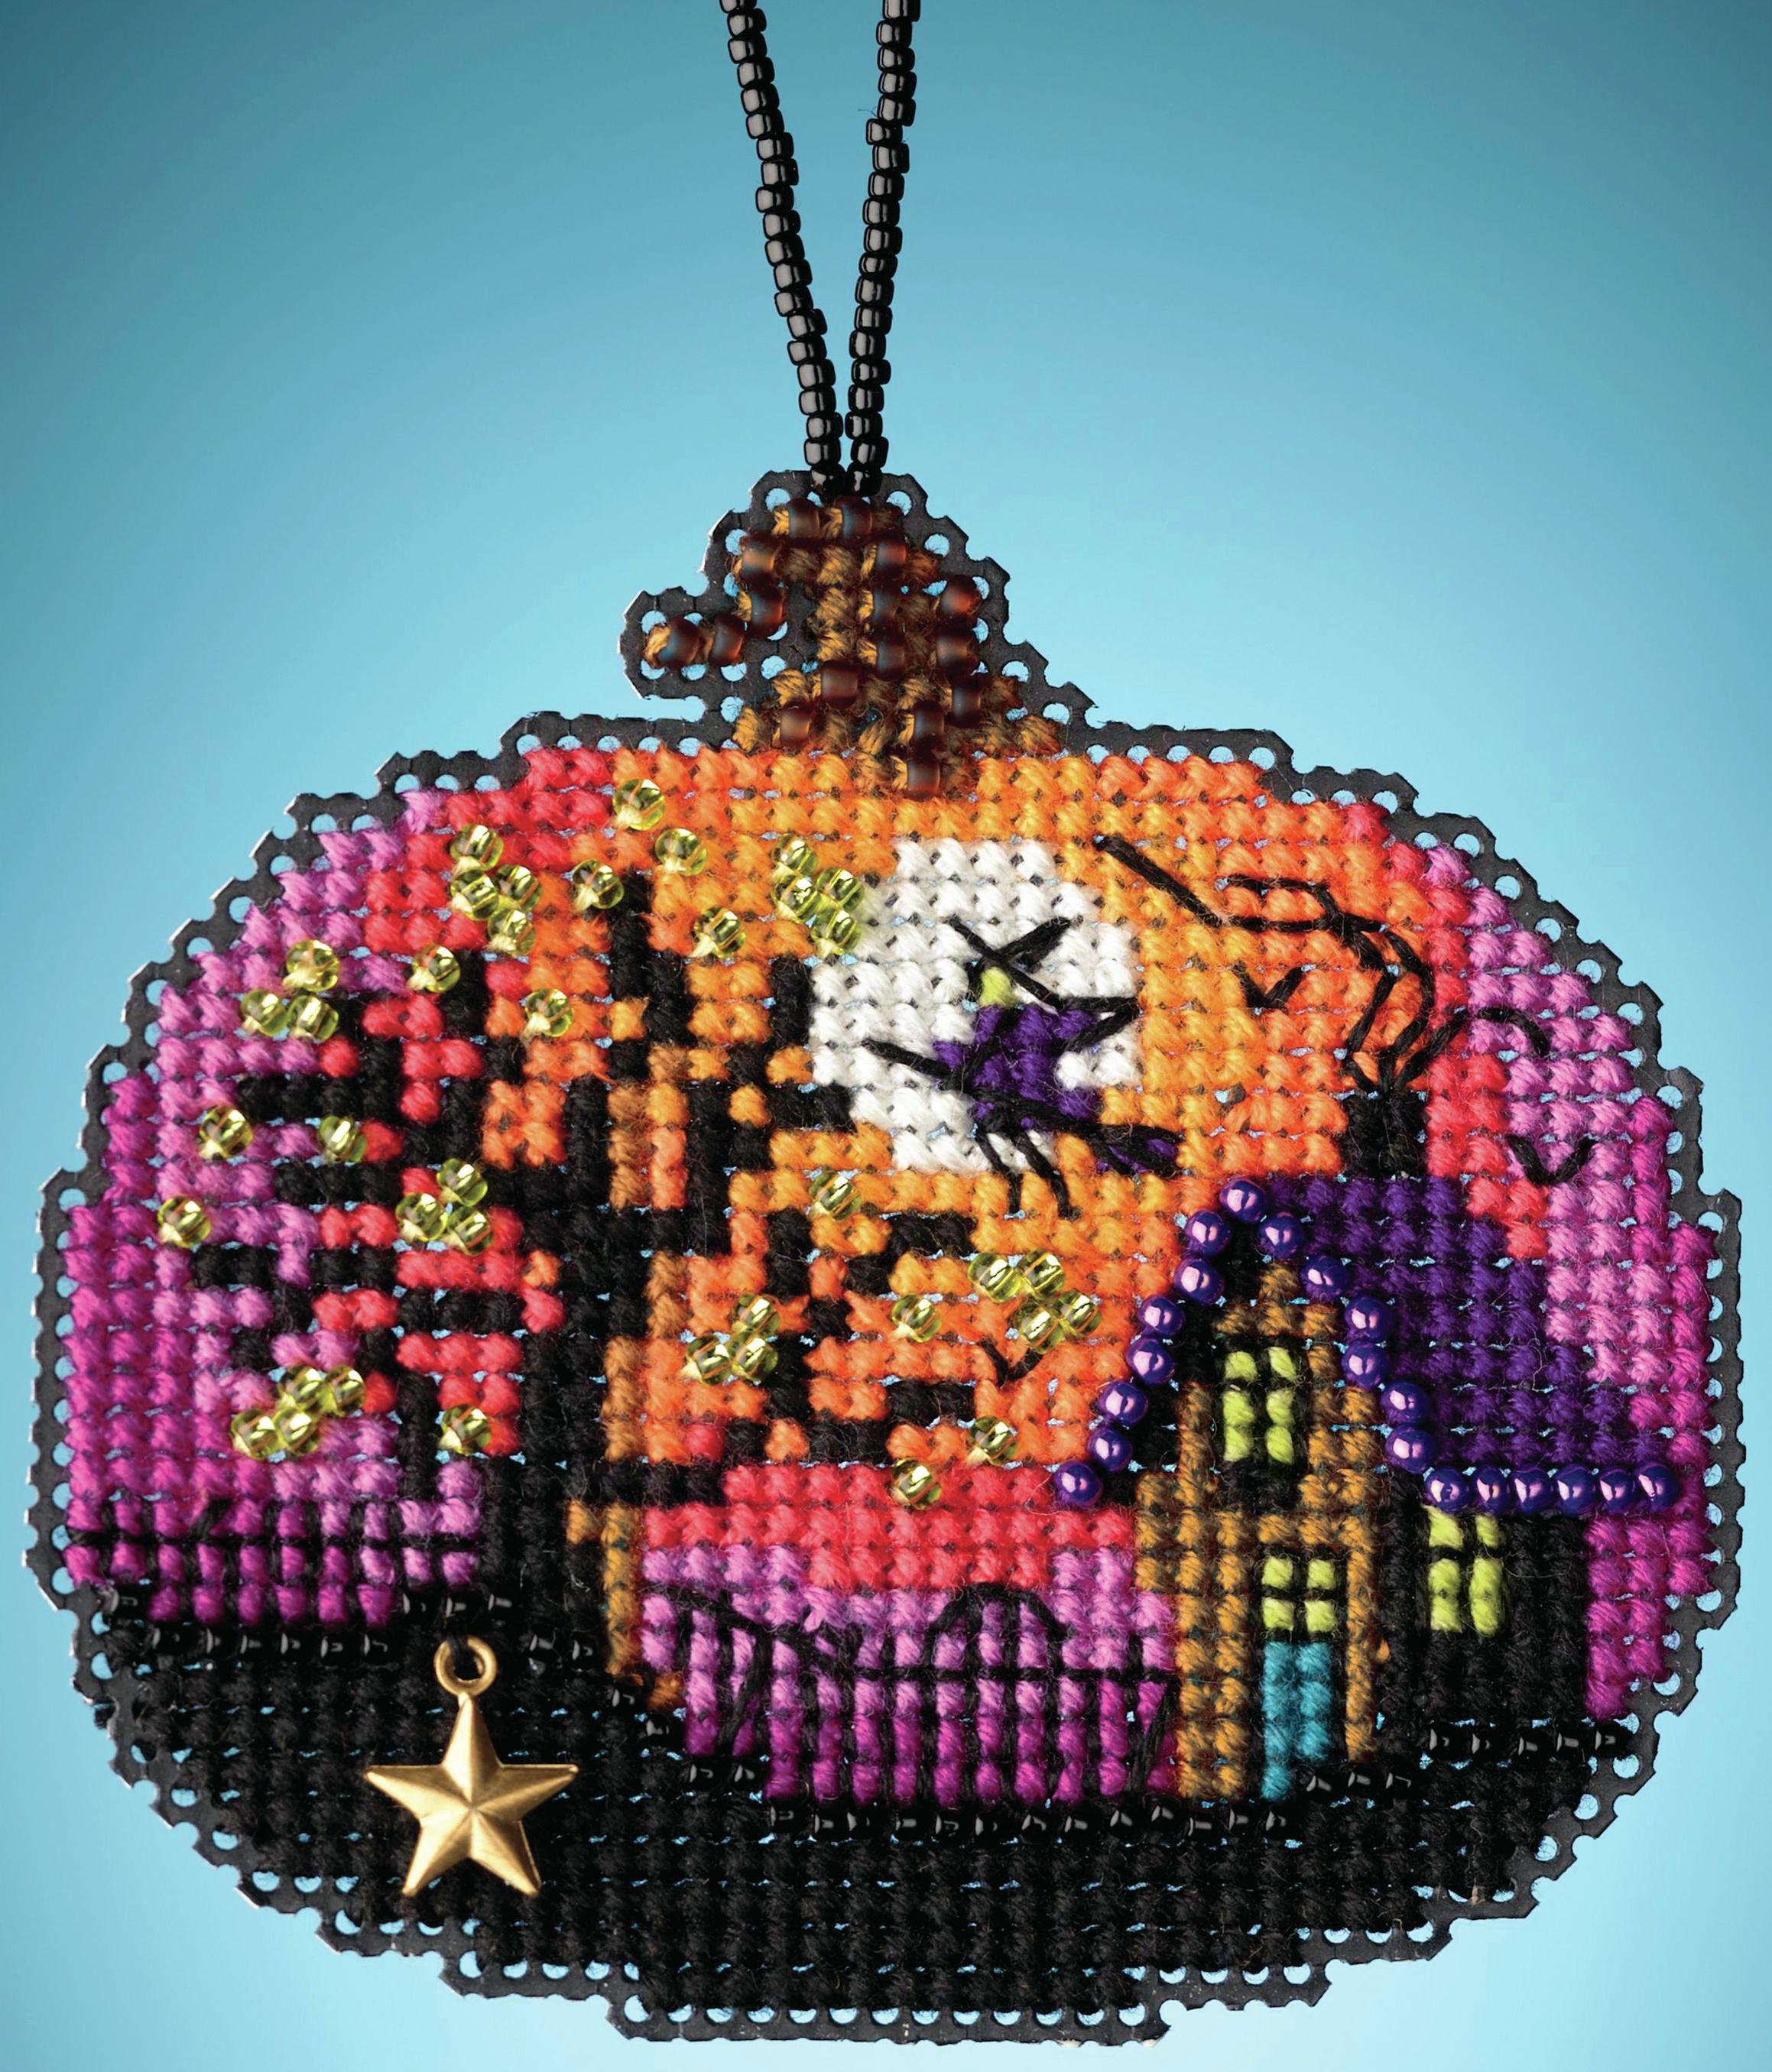 Bewitching Pumpkin counted cross stitch kit